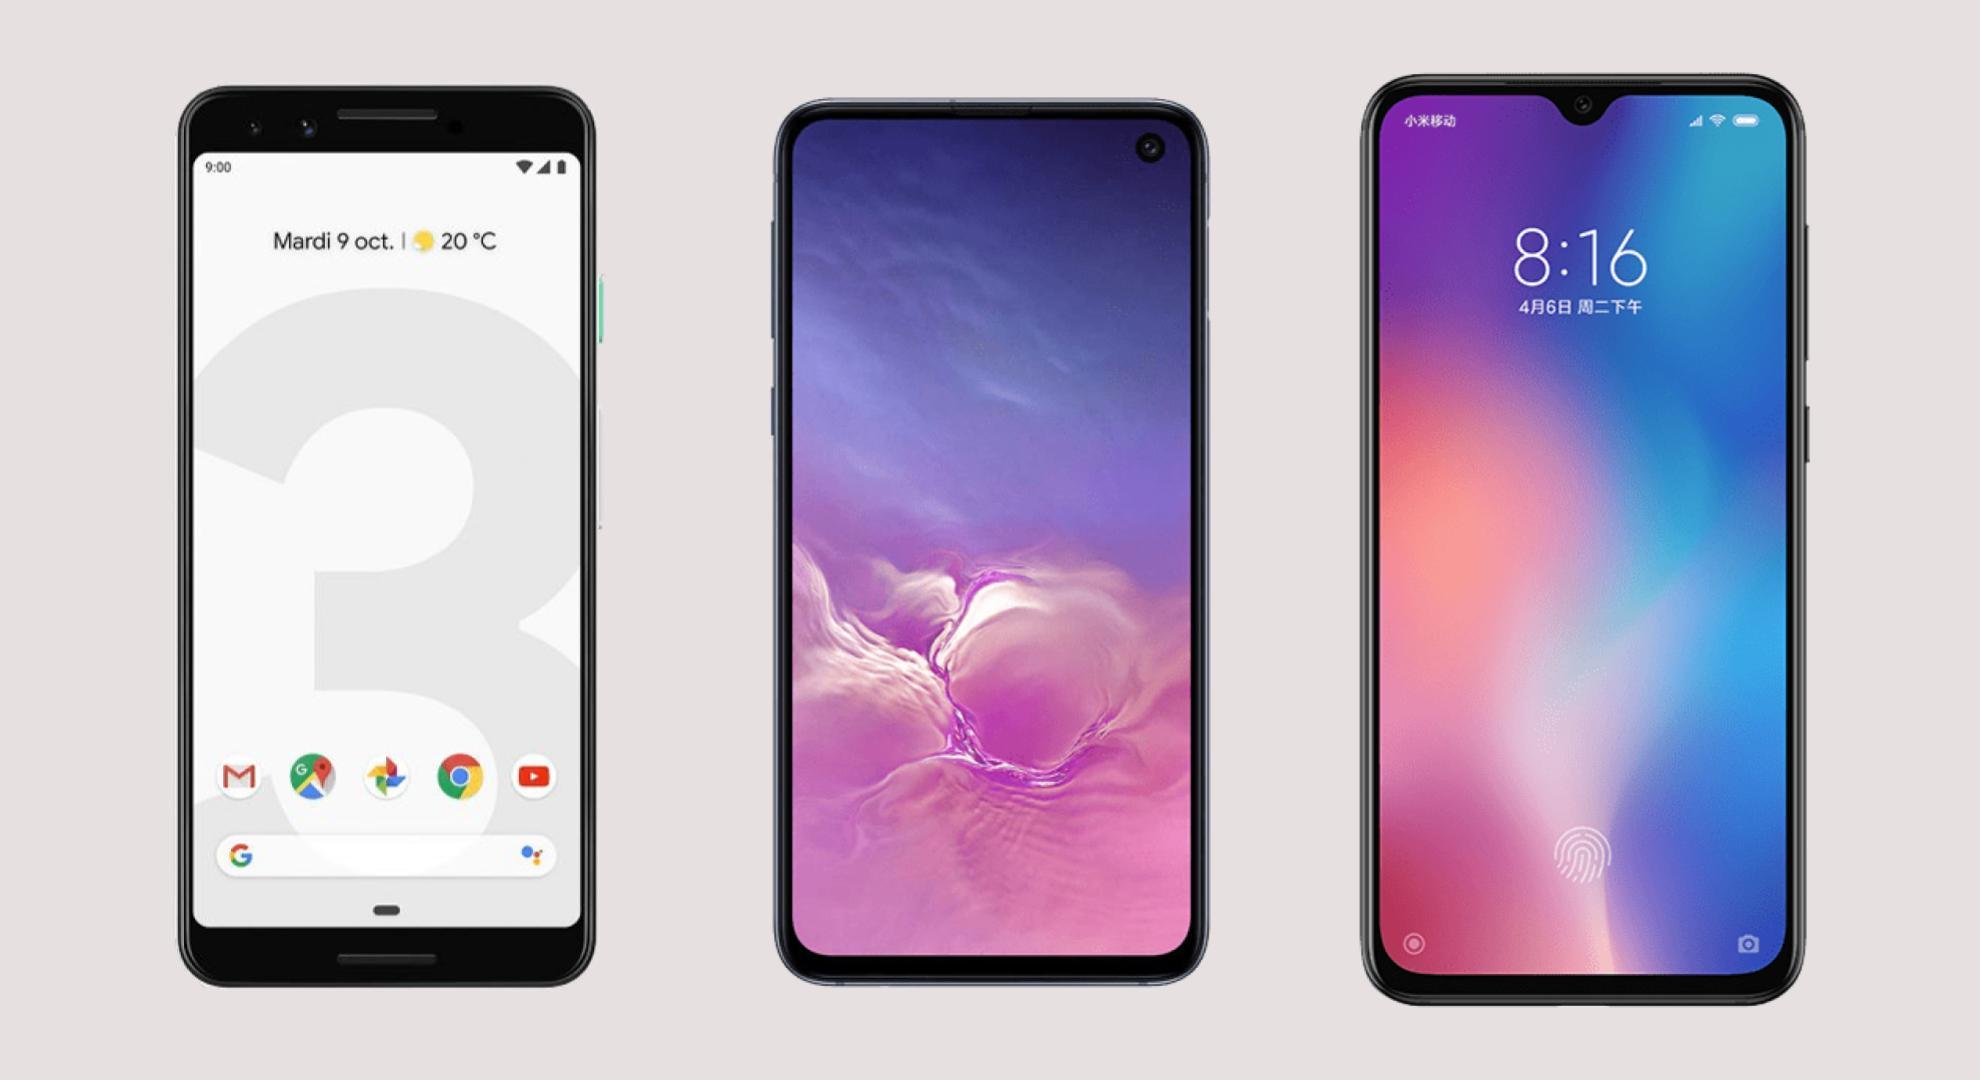 meilleur smartphone chinois 6 pouces